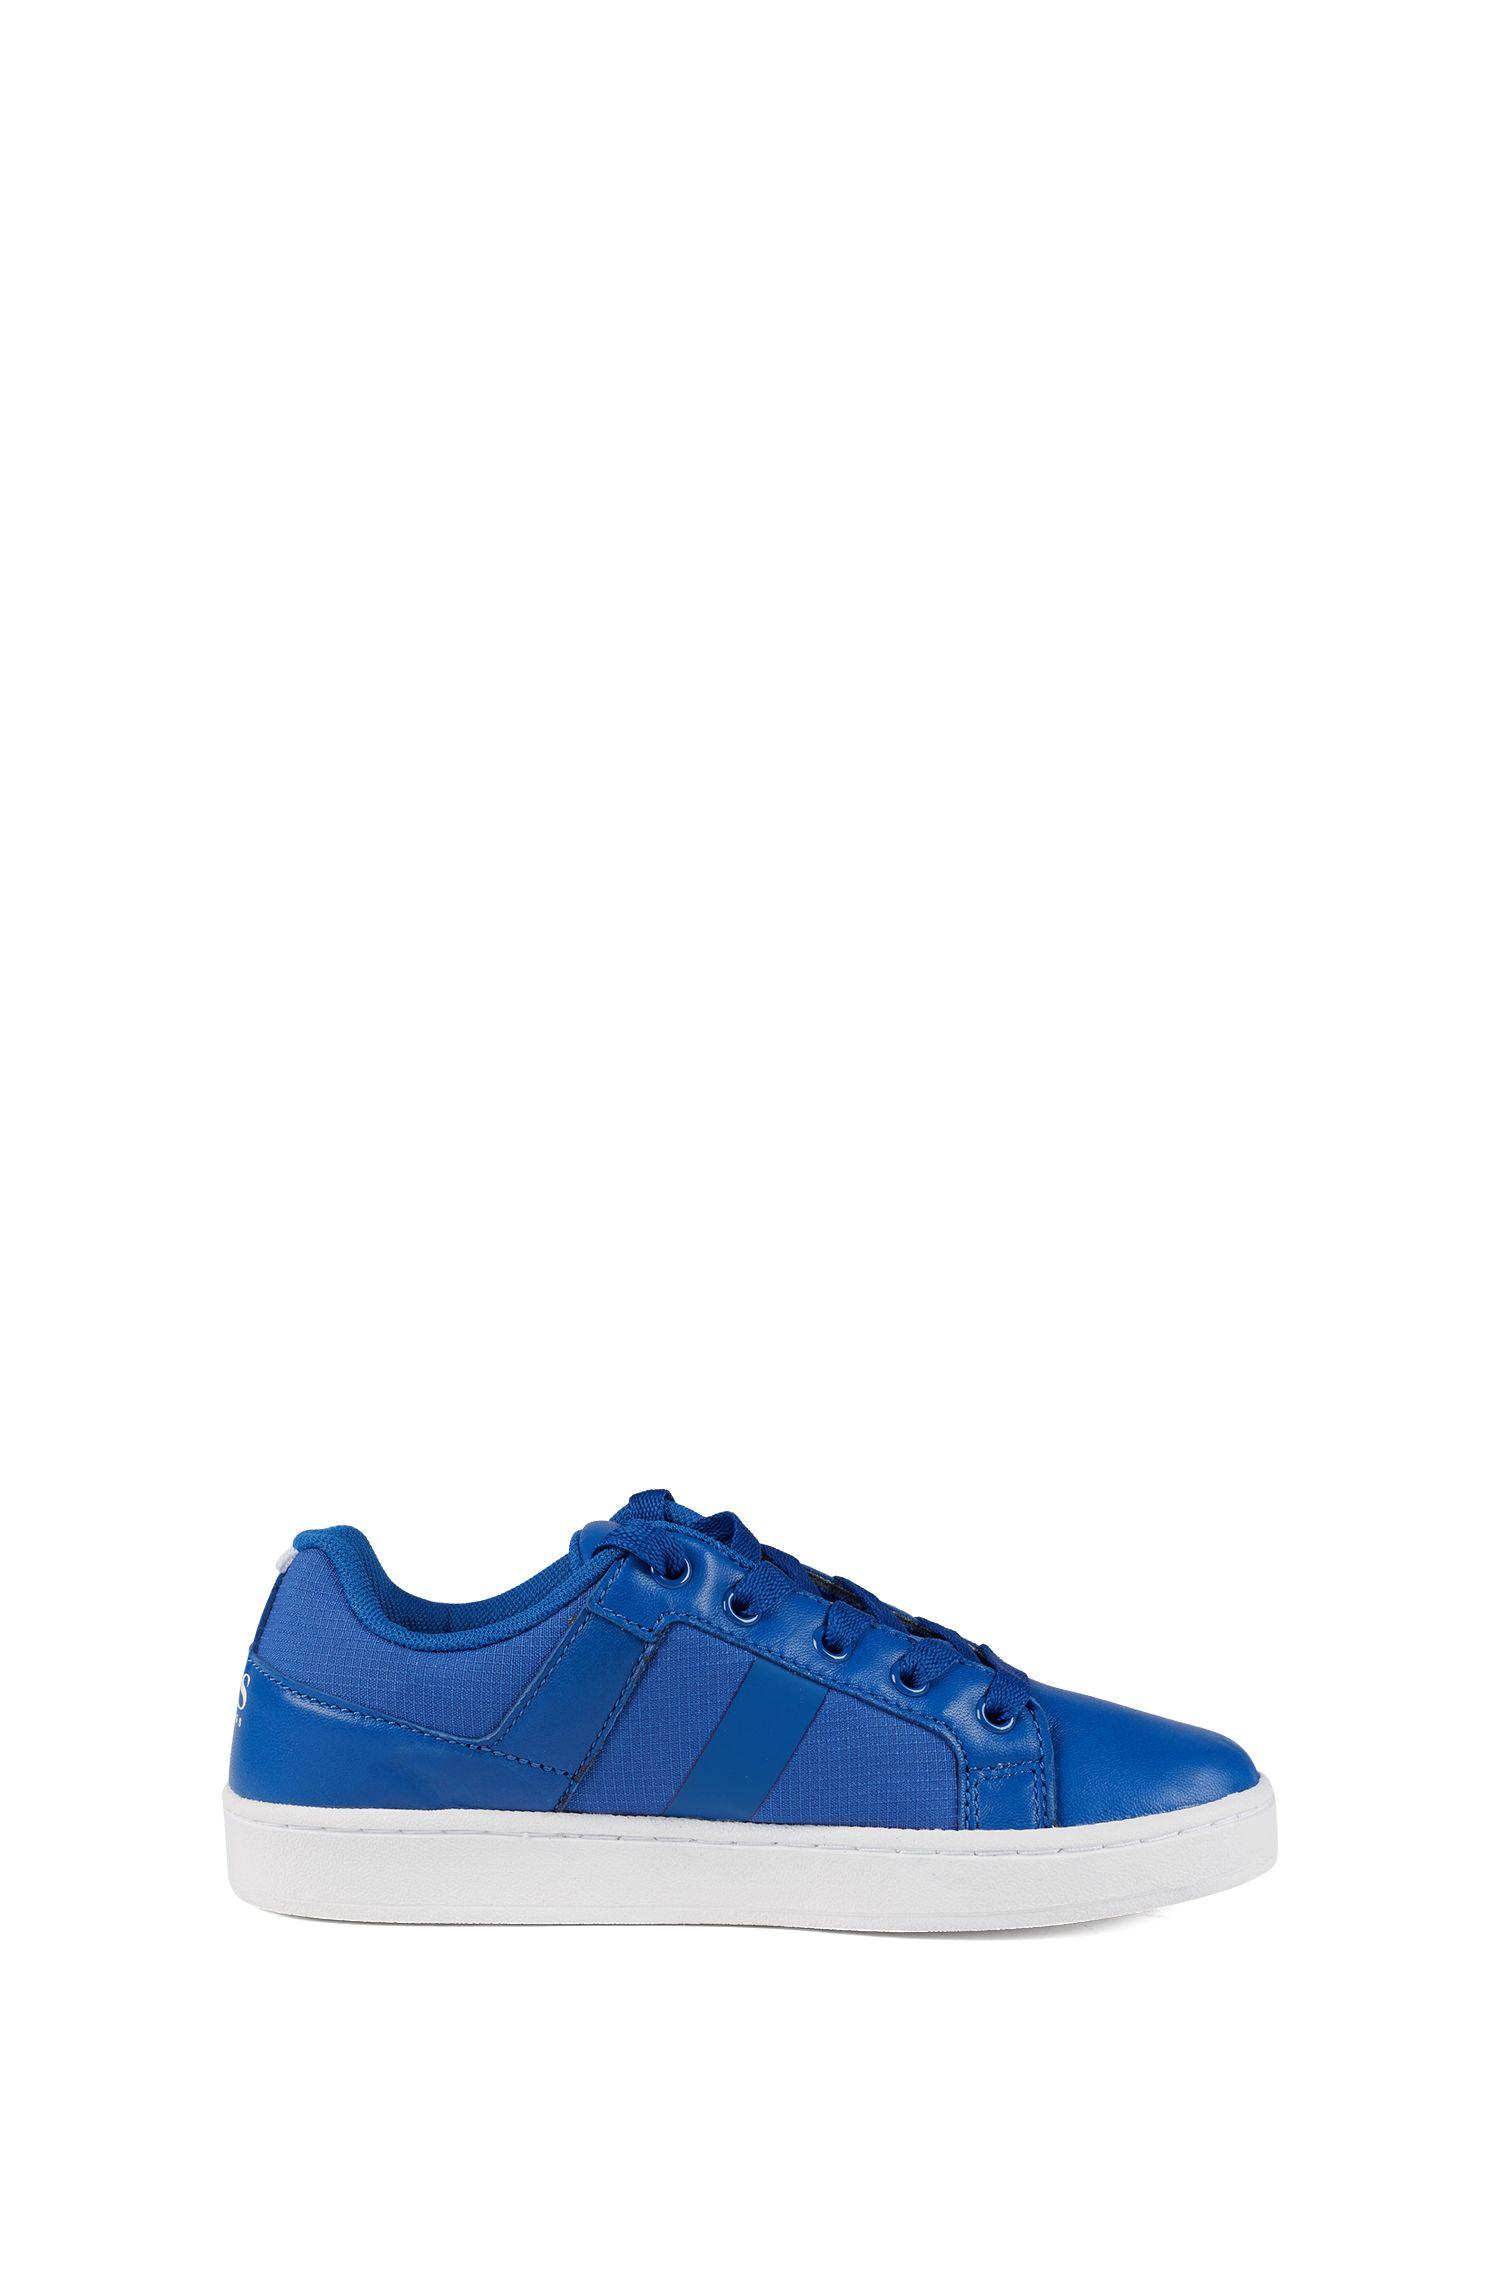 Kids-Sneakers aus Leder und Ripstop-Nylon, Blau